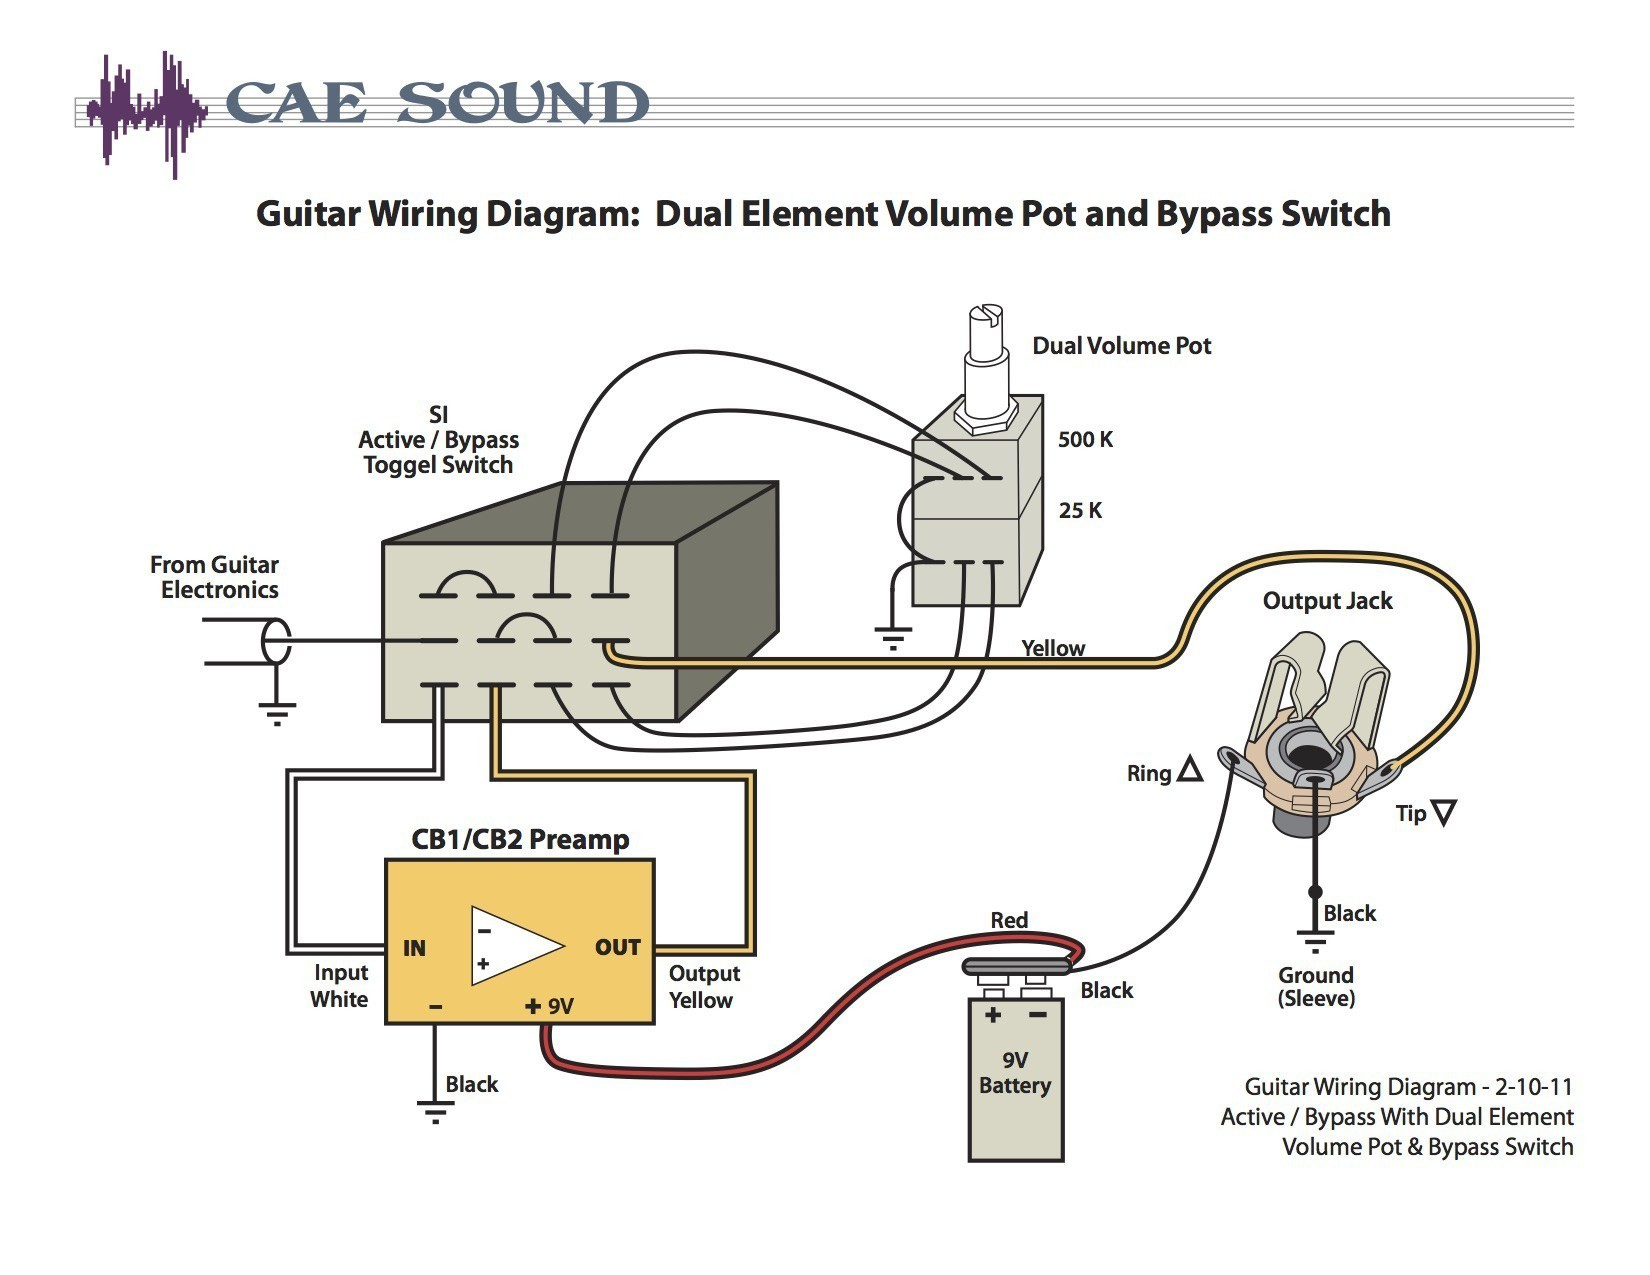 Guitar Cab Wiring Free Download Wiring Diagrams Pictures Wiring